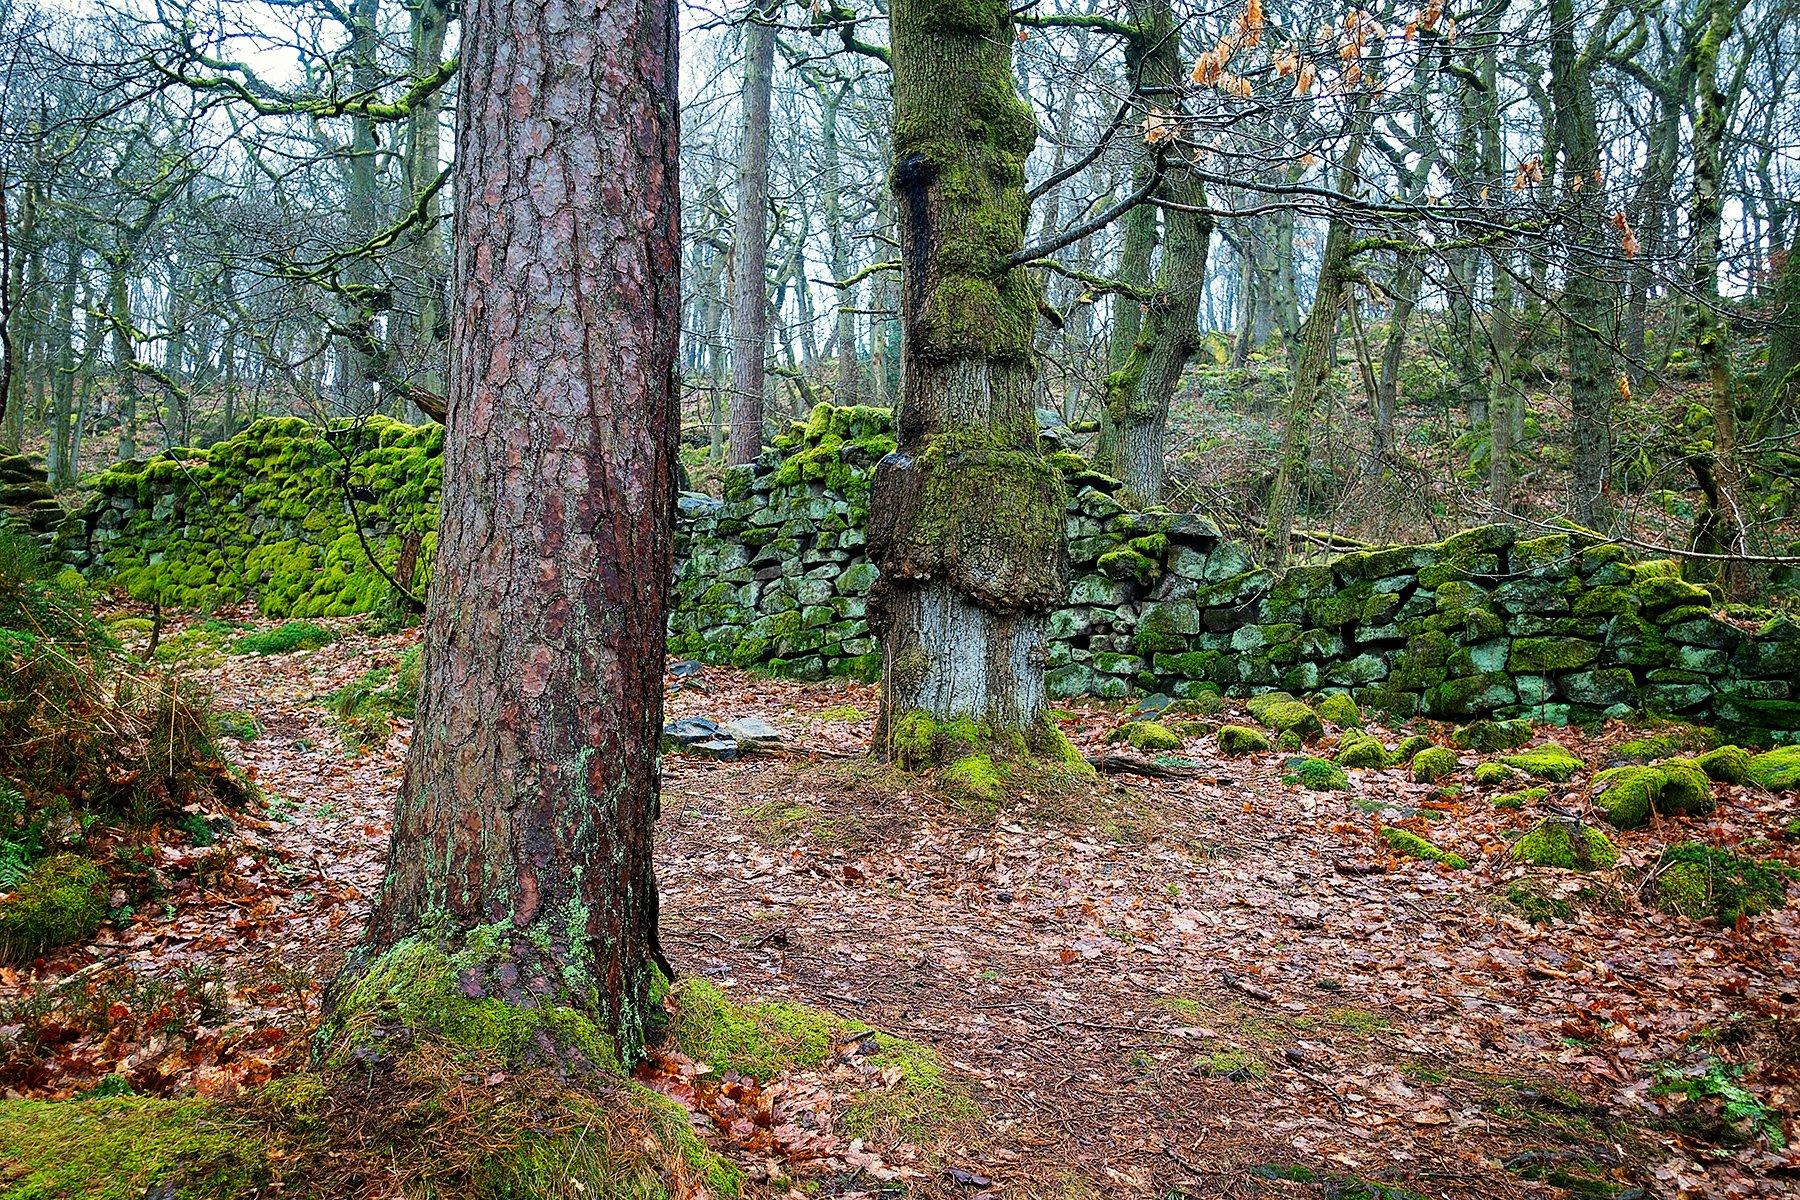 Padley Gorge in the Peak District